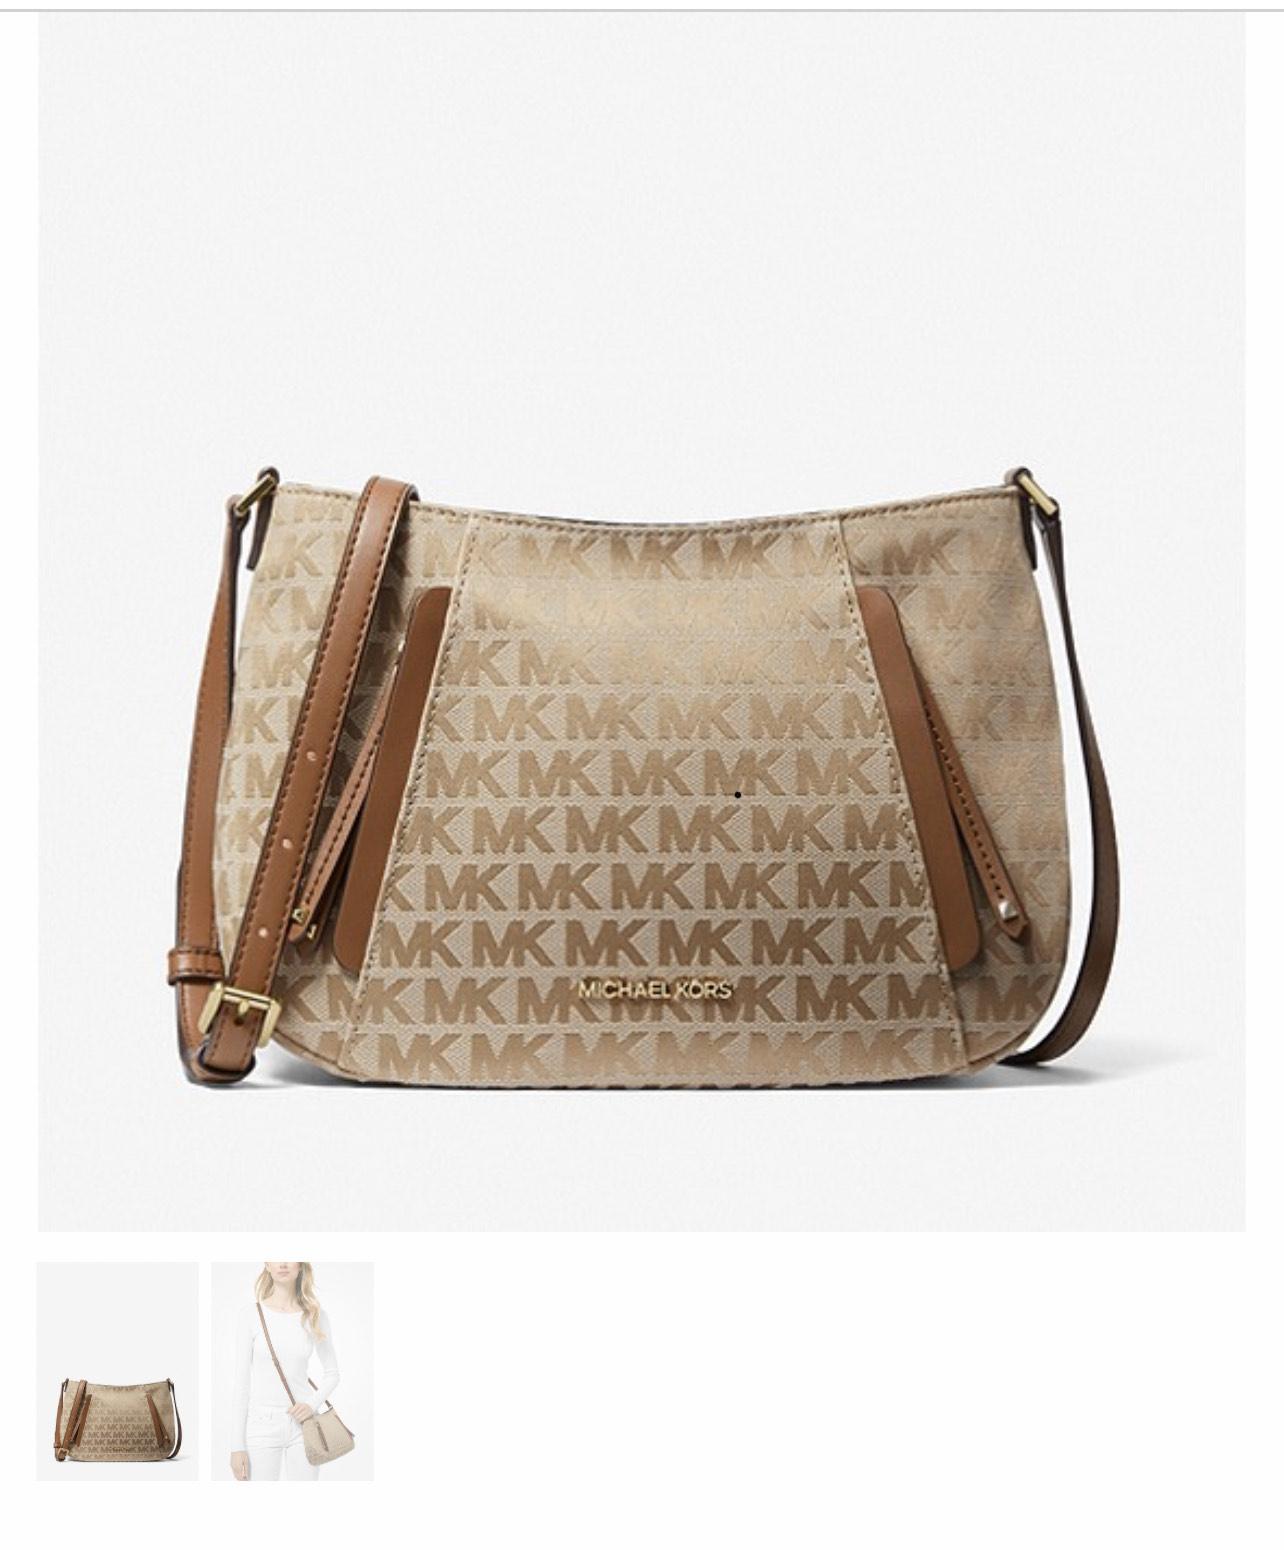 MICHAEL MICHAEL KORS Evie Medium Logo Jacquard Messenger Bag £89 Michael Kors Shop